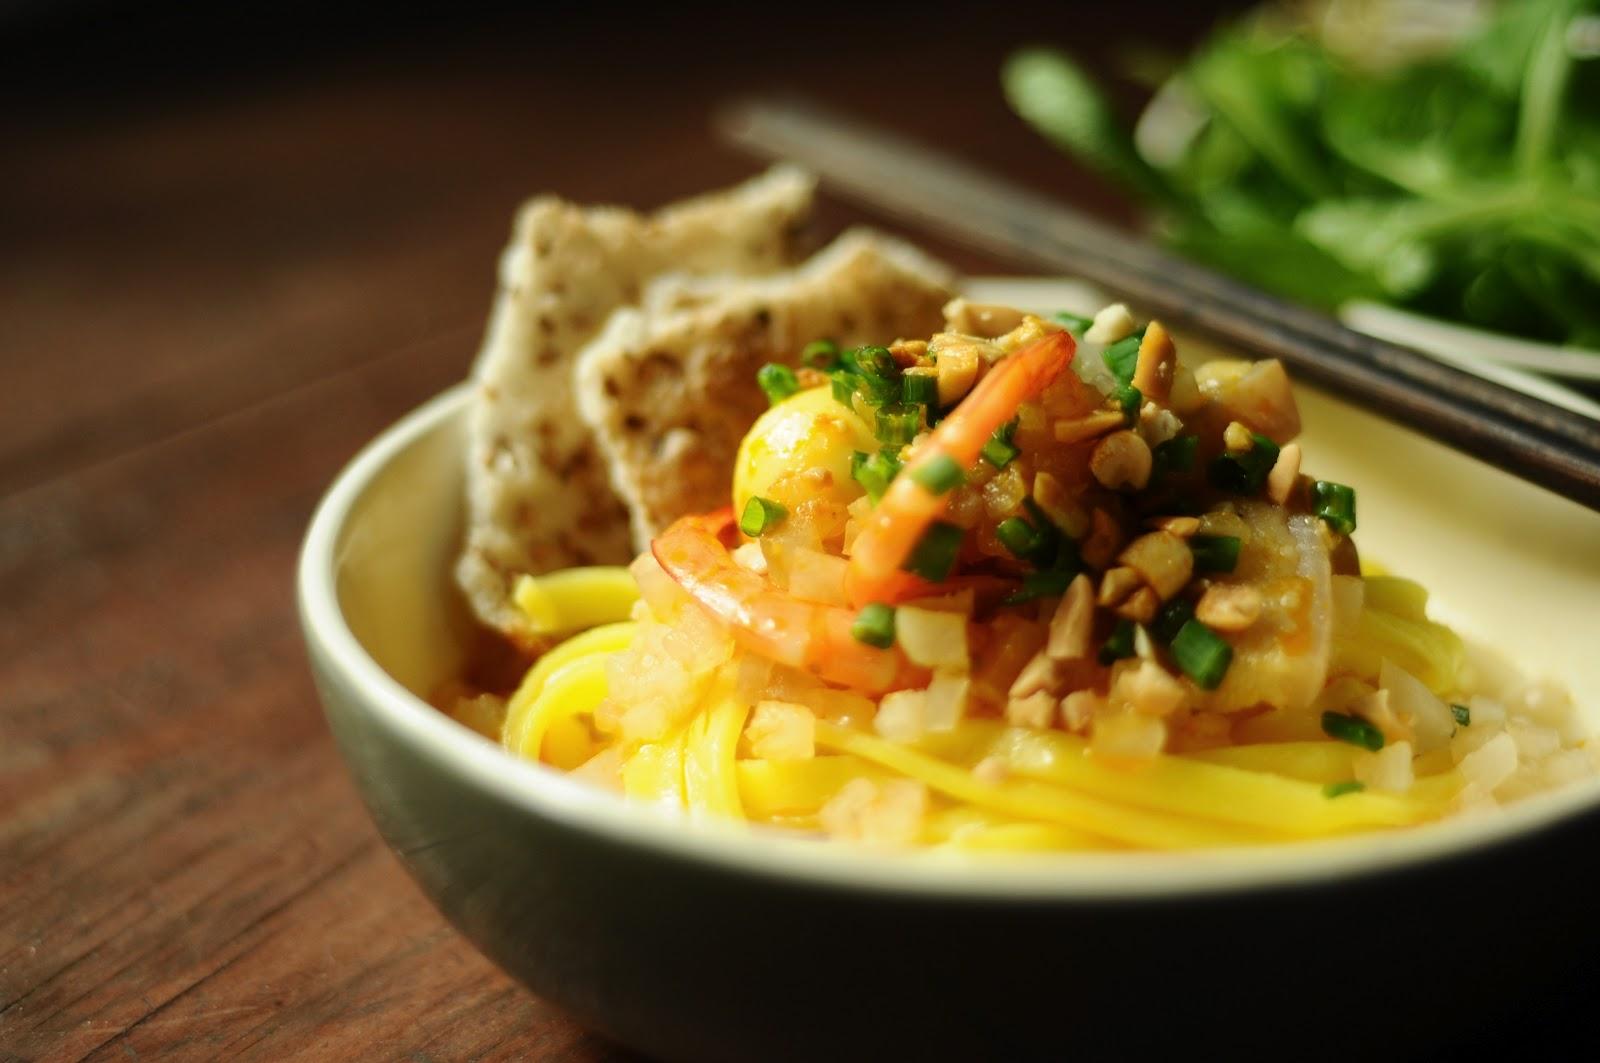 People also make Quang noodle for vegans